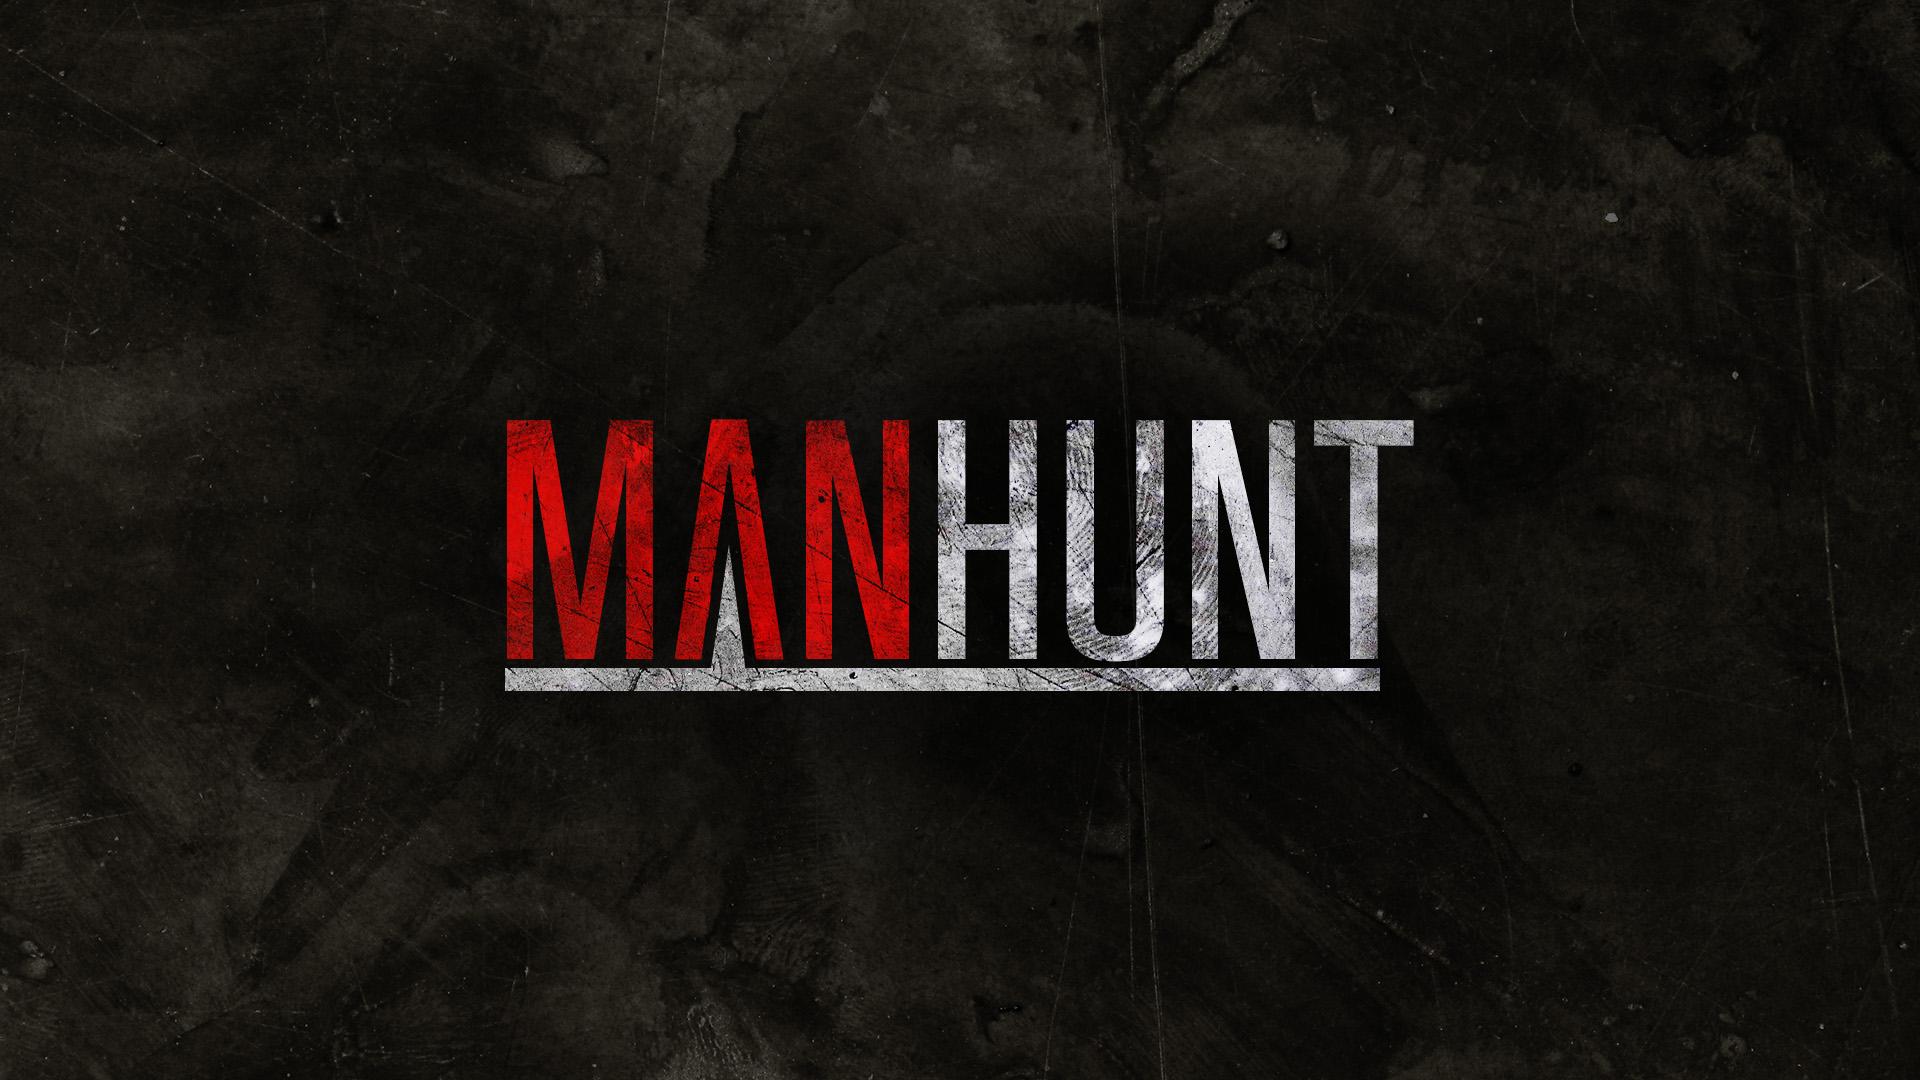 xManhunt_V2_4.jpg